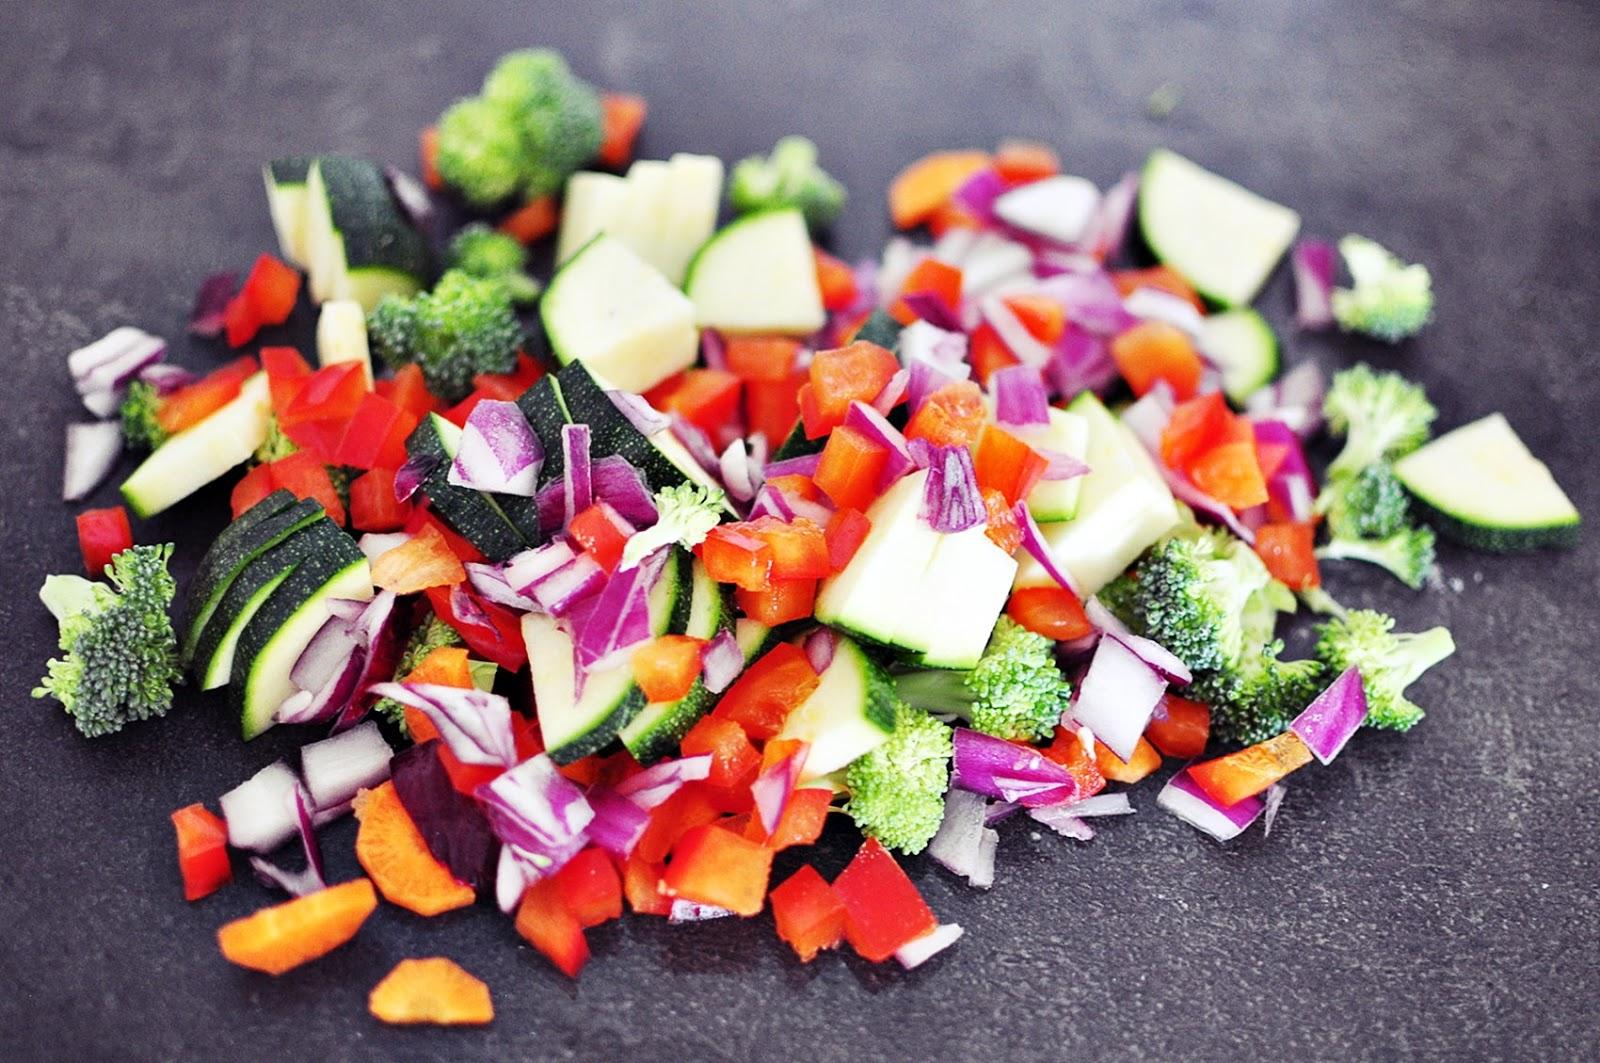 zdrowy-obiad